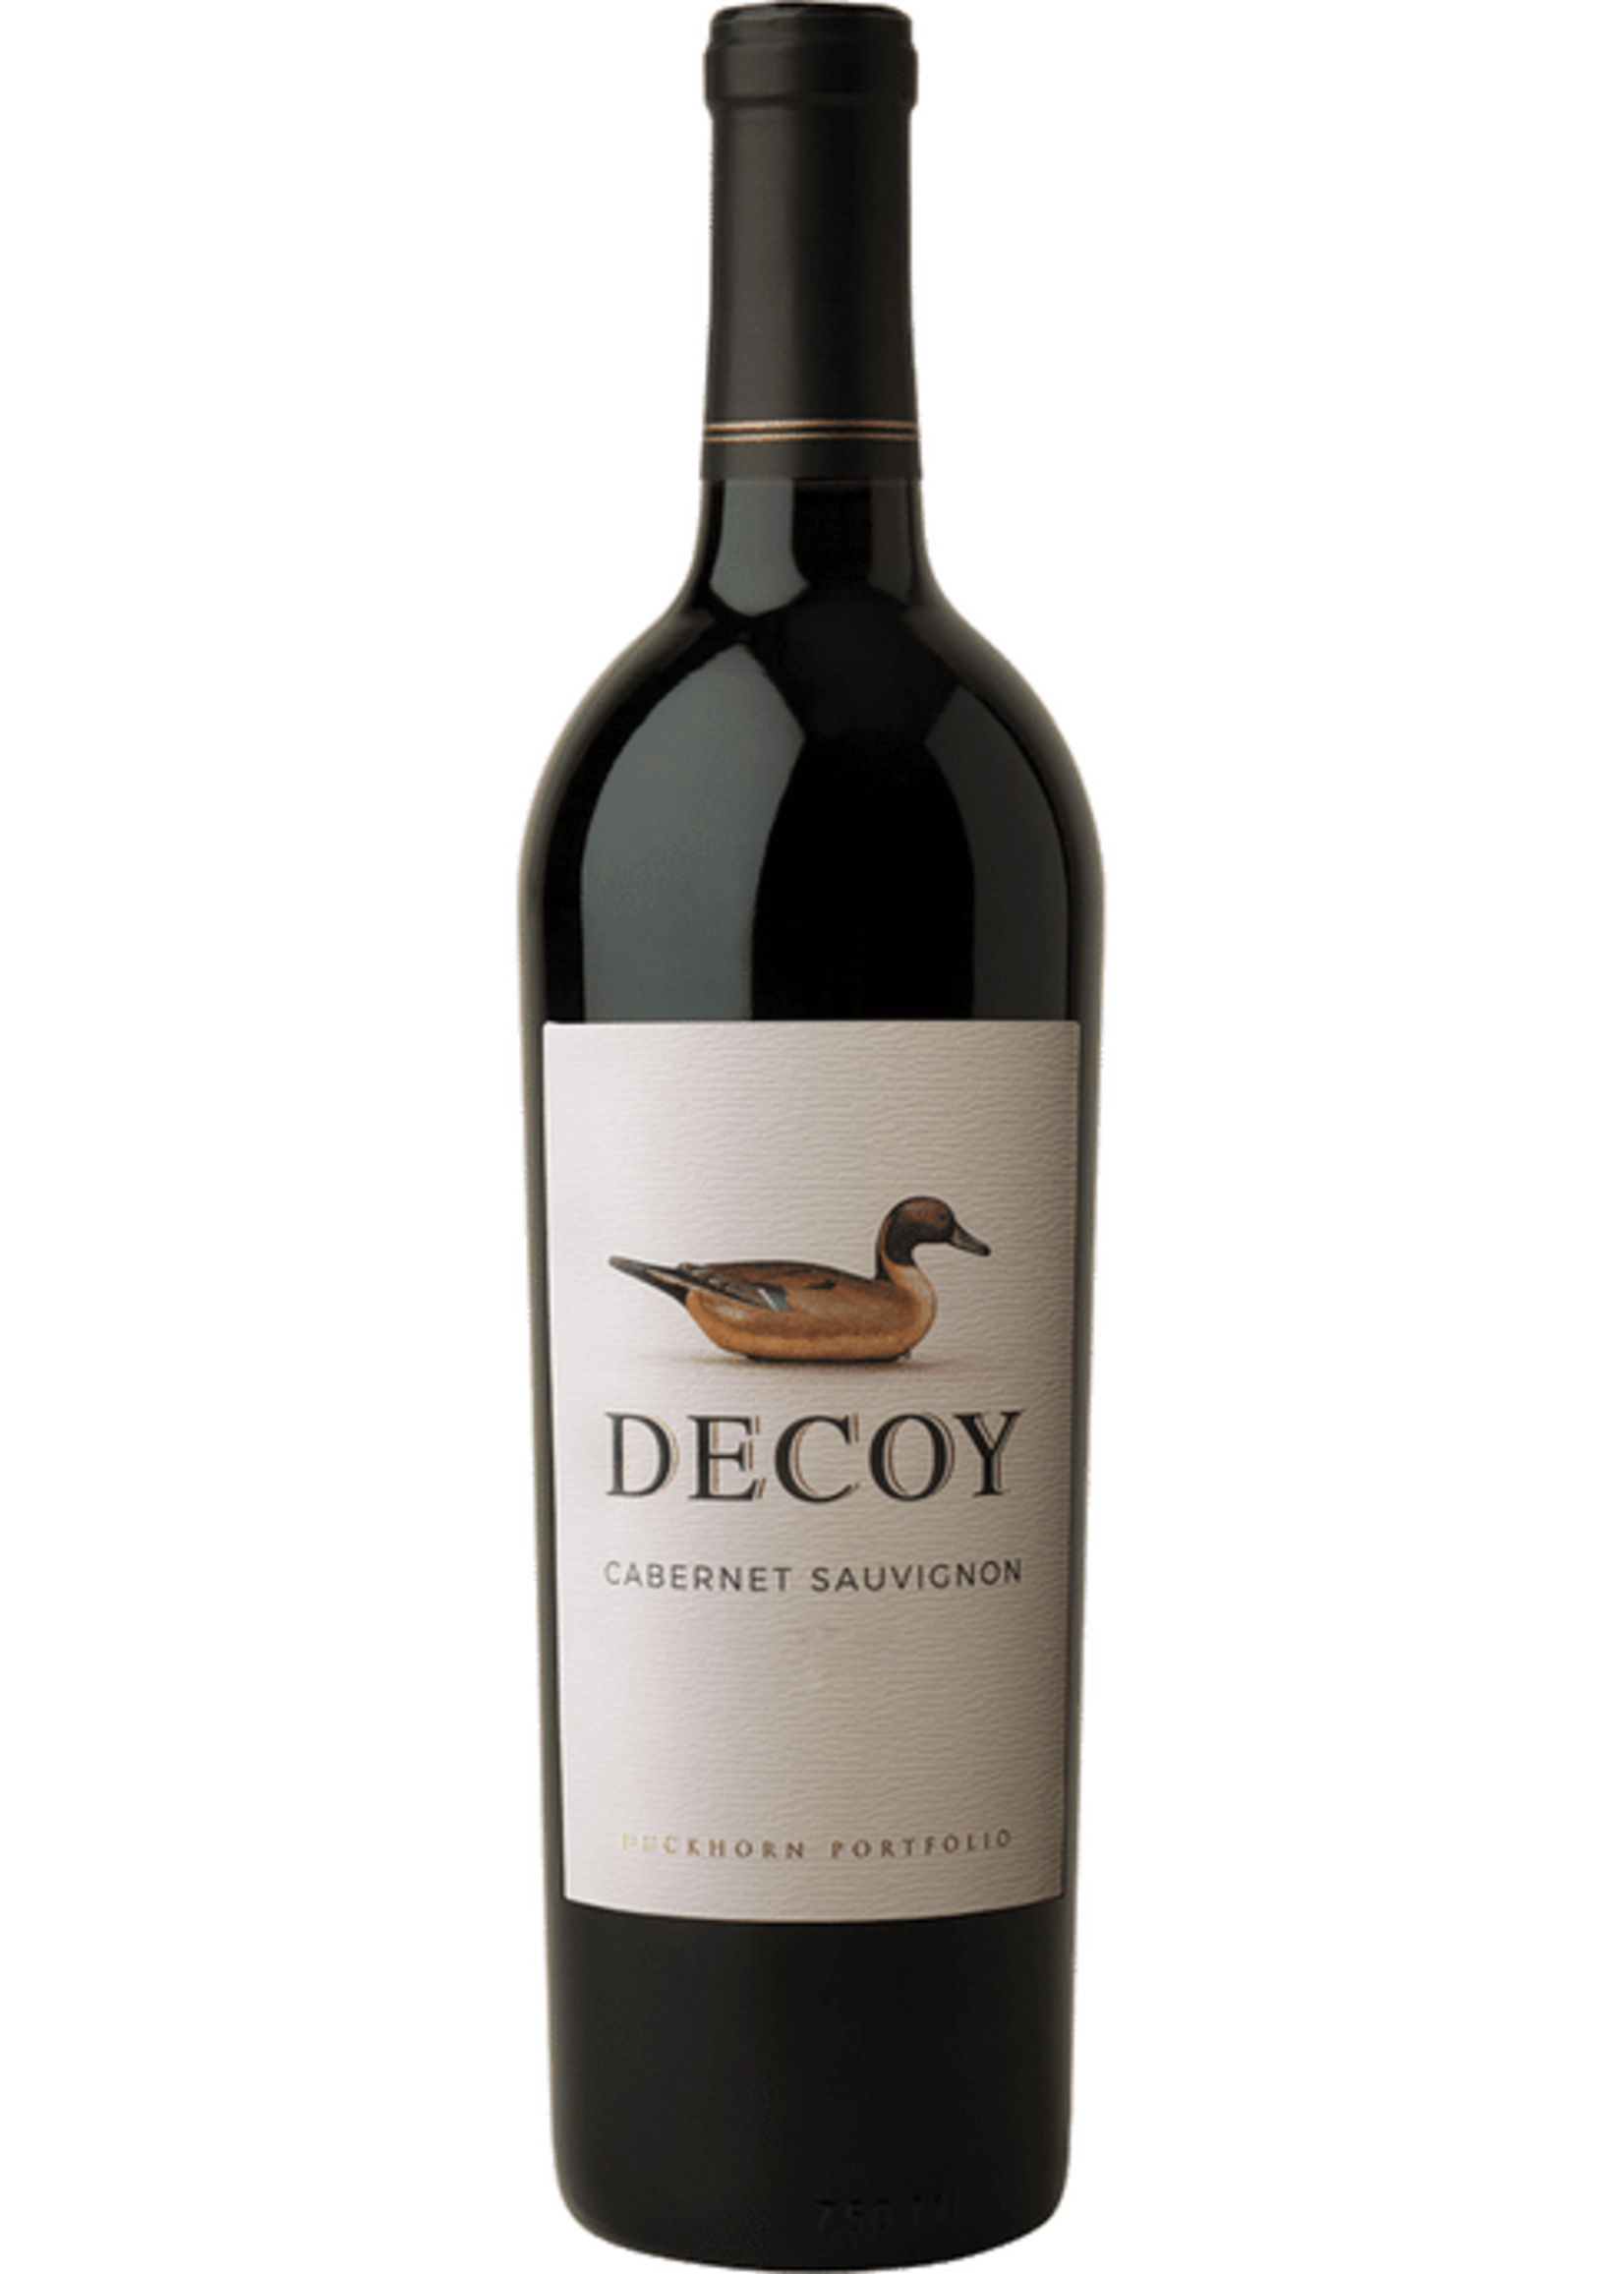 Decoy Decoy / Cabernet Sauvignon / 750mL